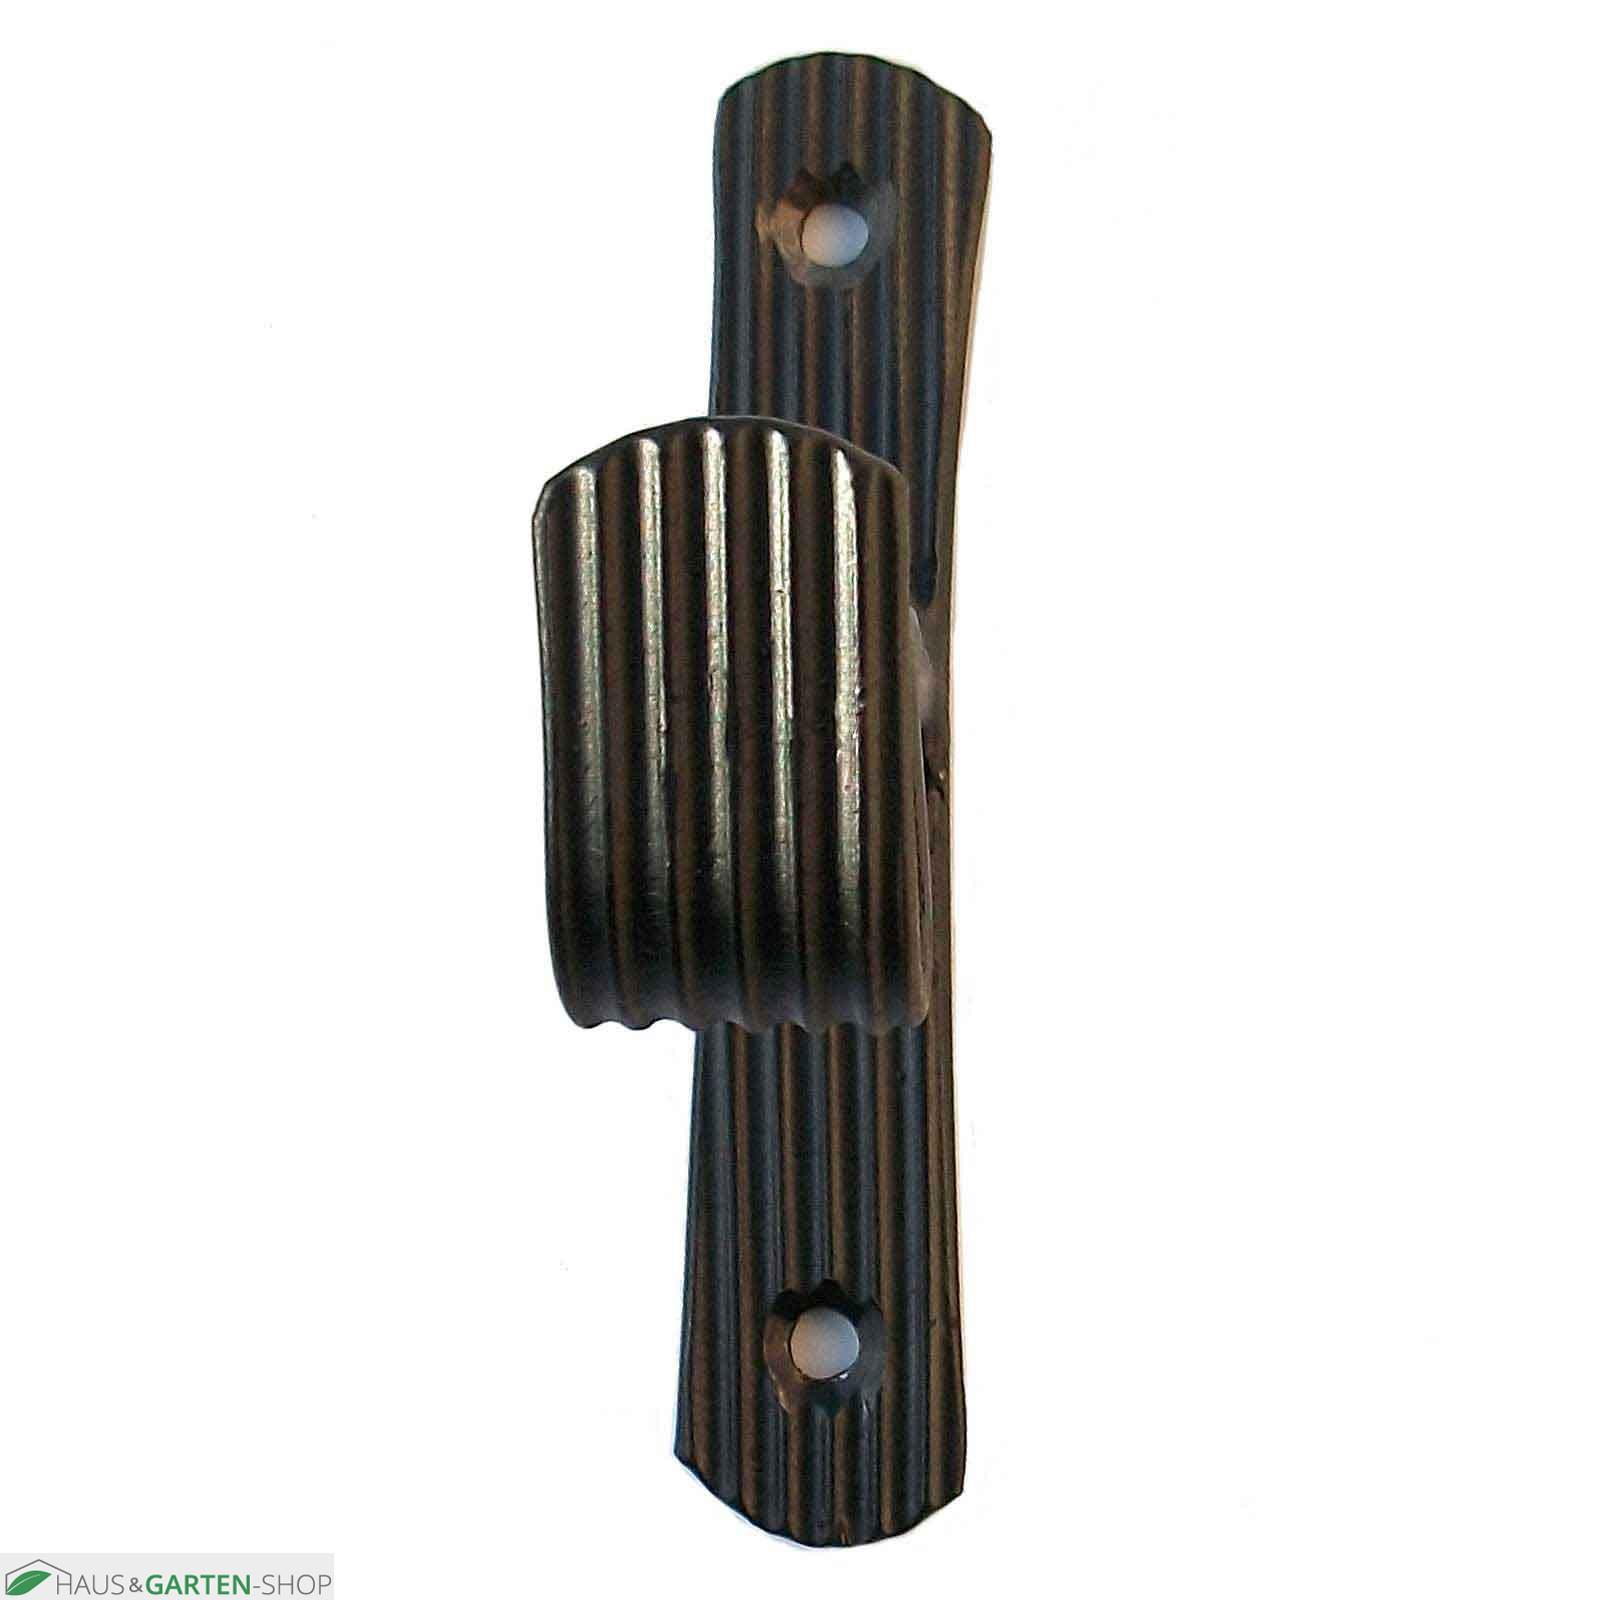 gardinenstangenhalter typ line schwarz lackiert metall. Black Bedroom Furniture Sets. Home Design Ideas